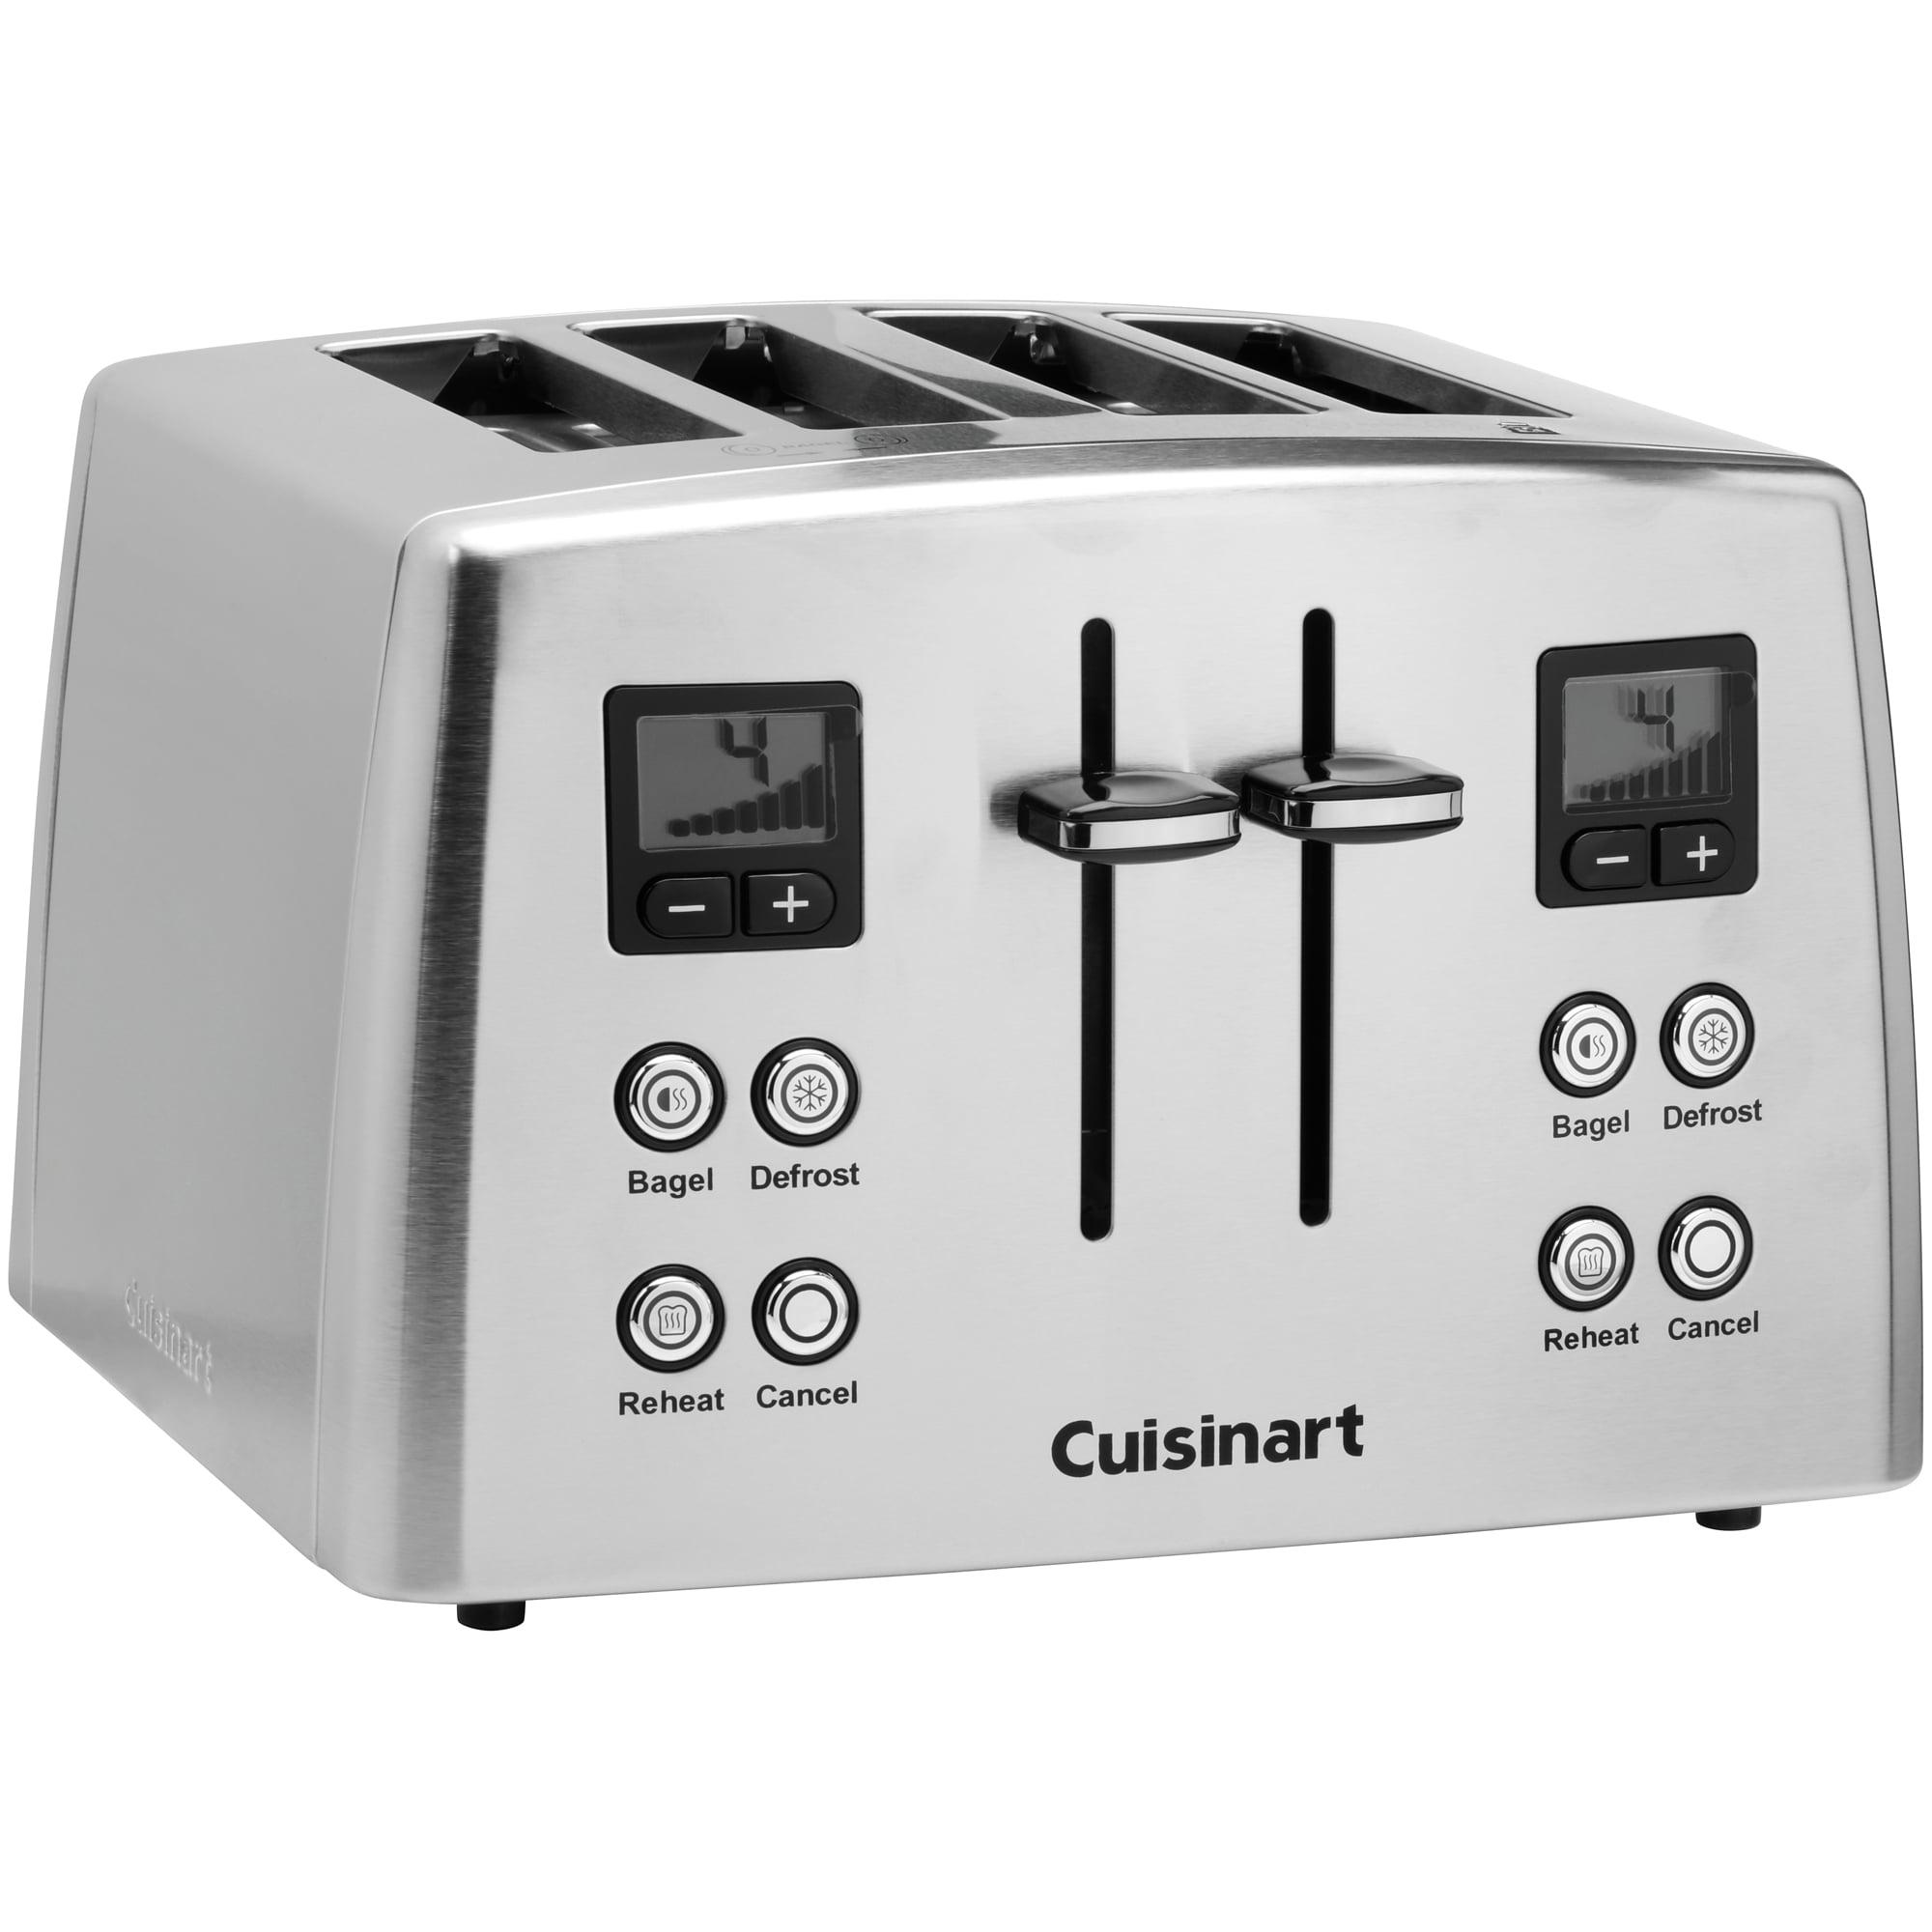 Cuisinart Countdown Classic 4 Slice Toaster Walmart